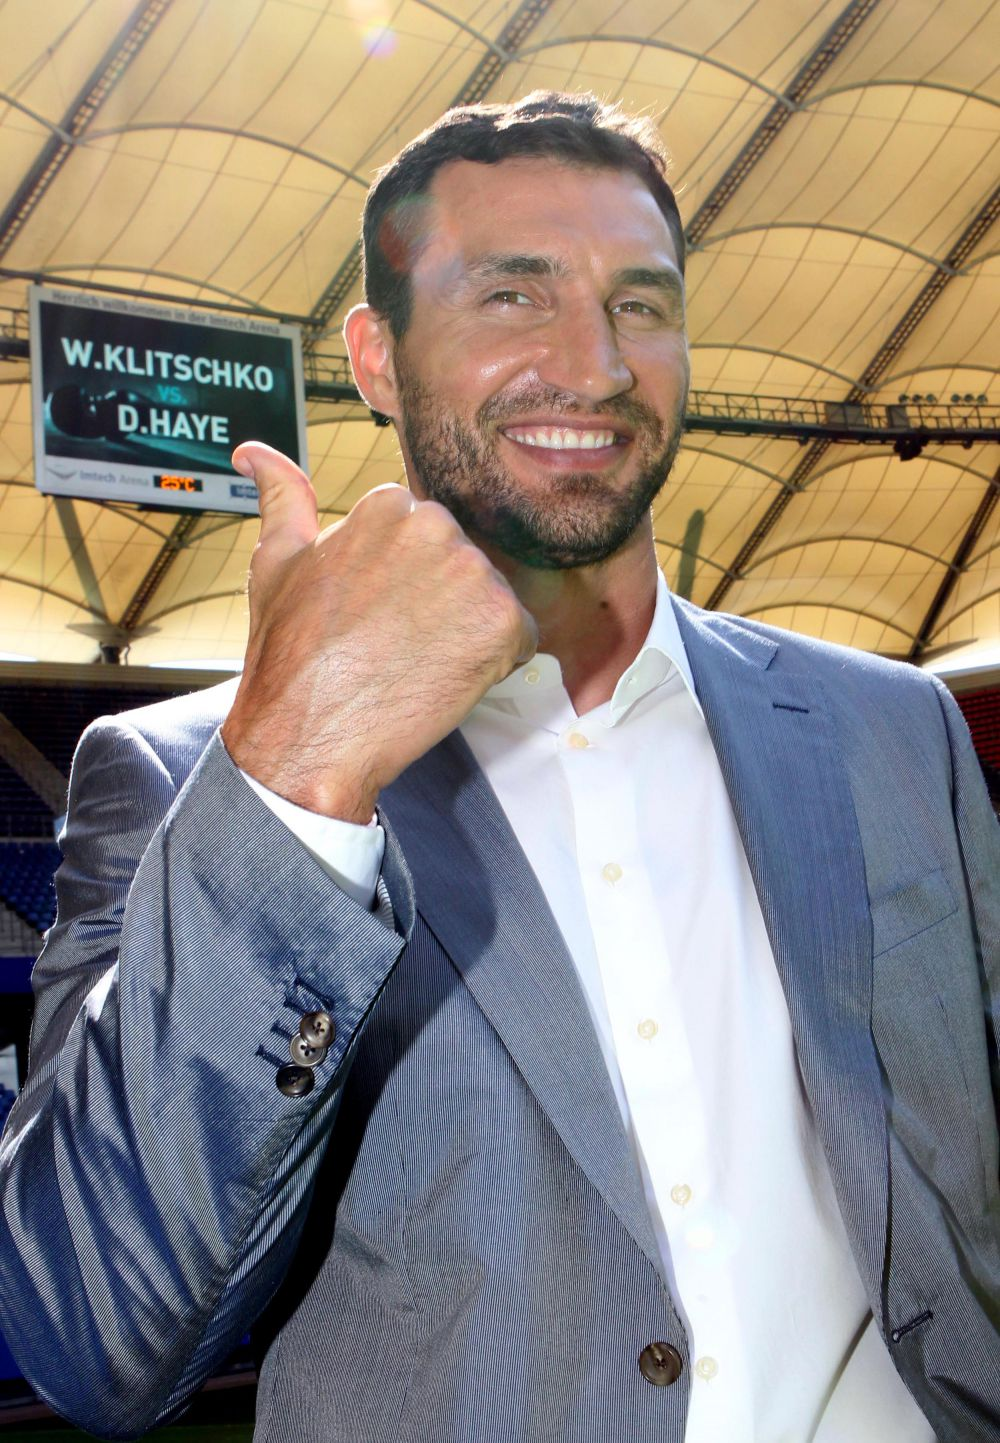 Владимир Кличко – украинский боксер